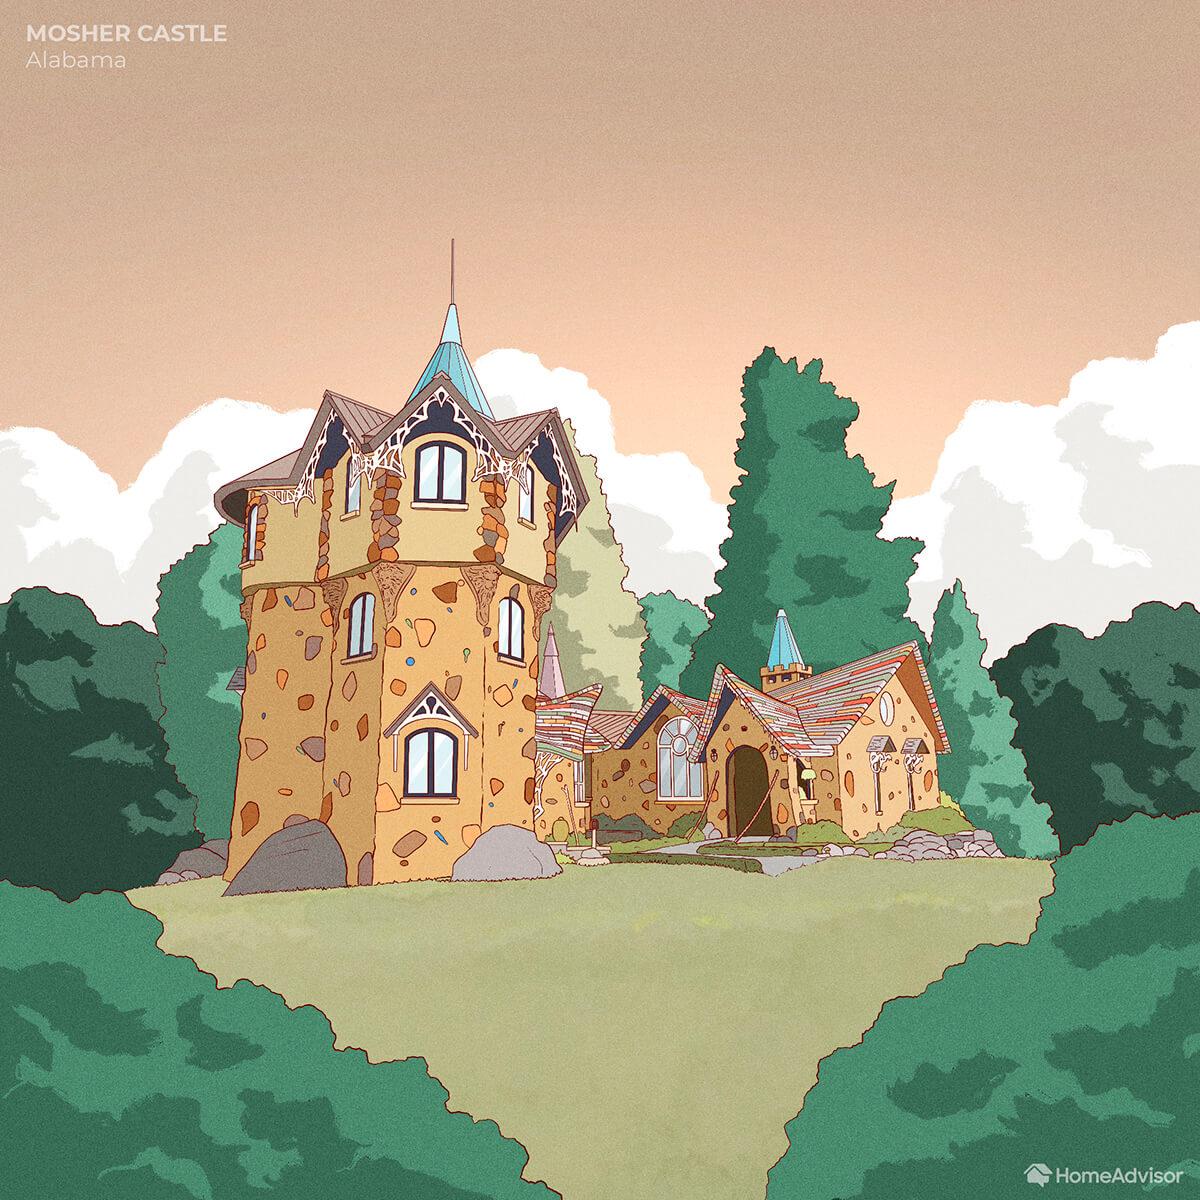 Mosher Castle